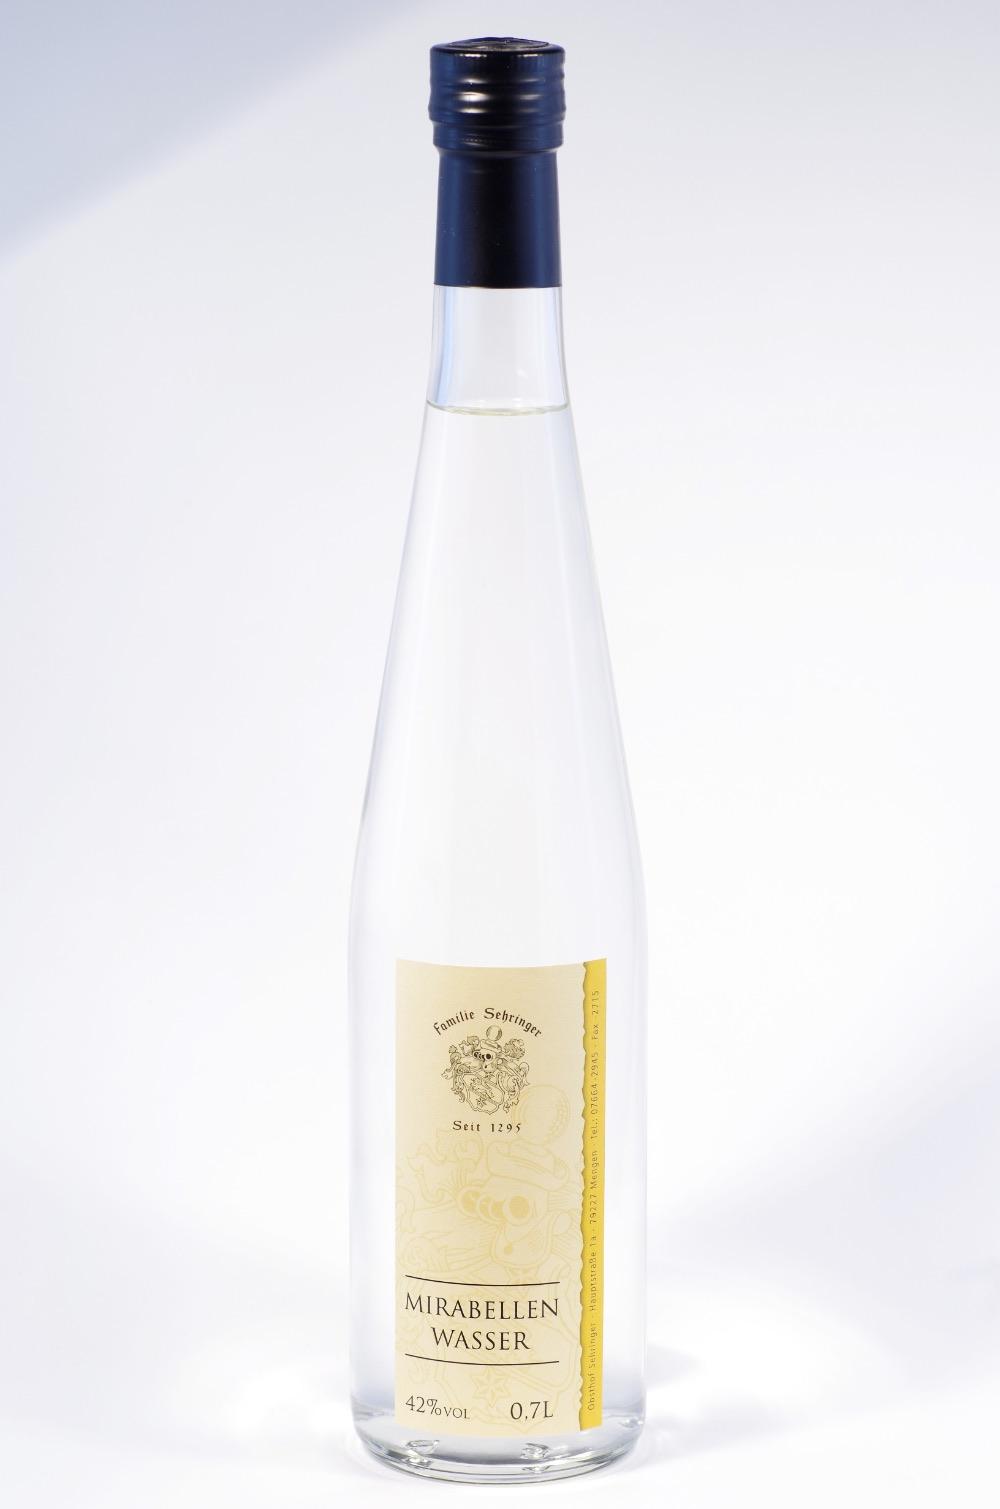 Sehringer Mirabellenwasser Mirballenbrand Bild